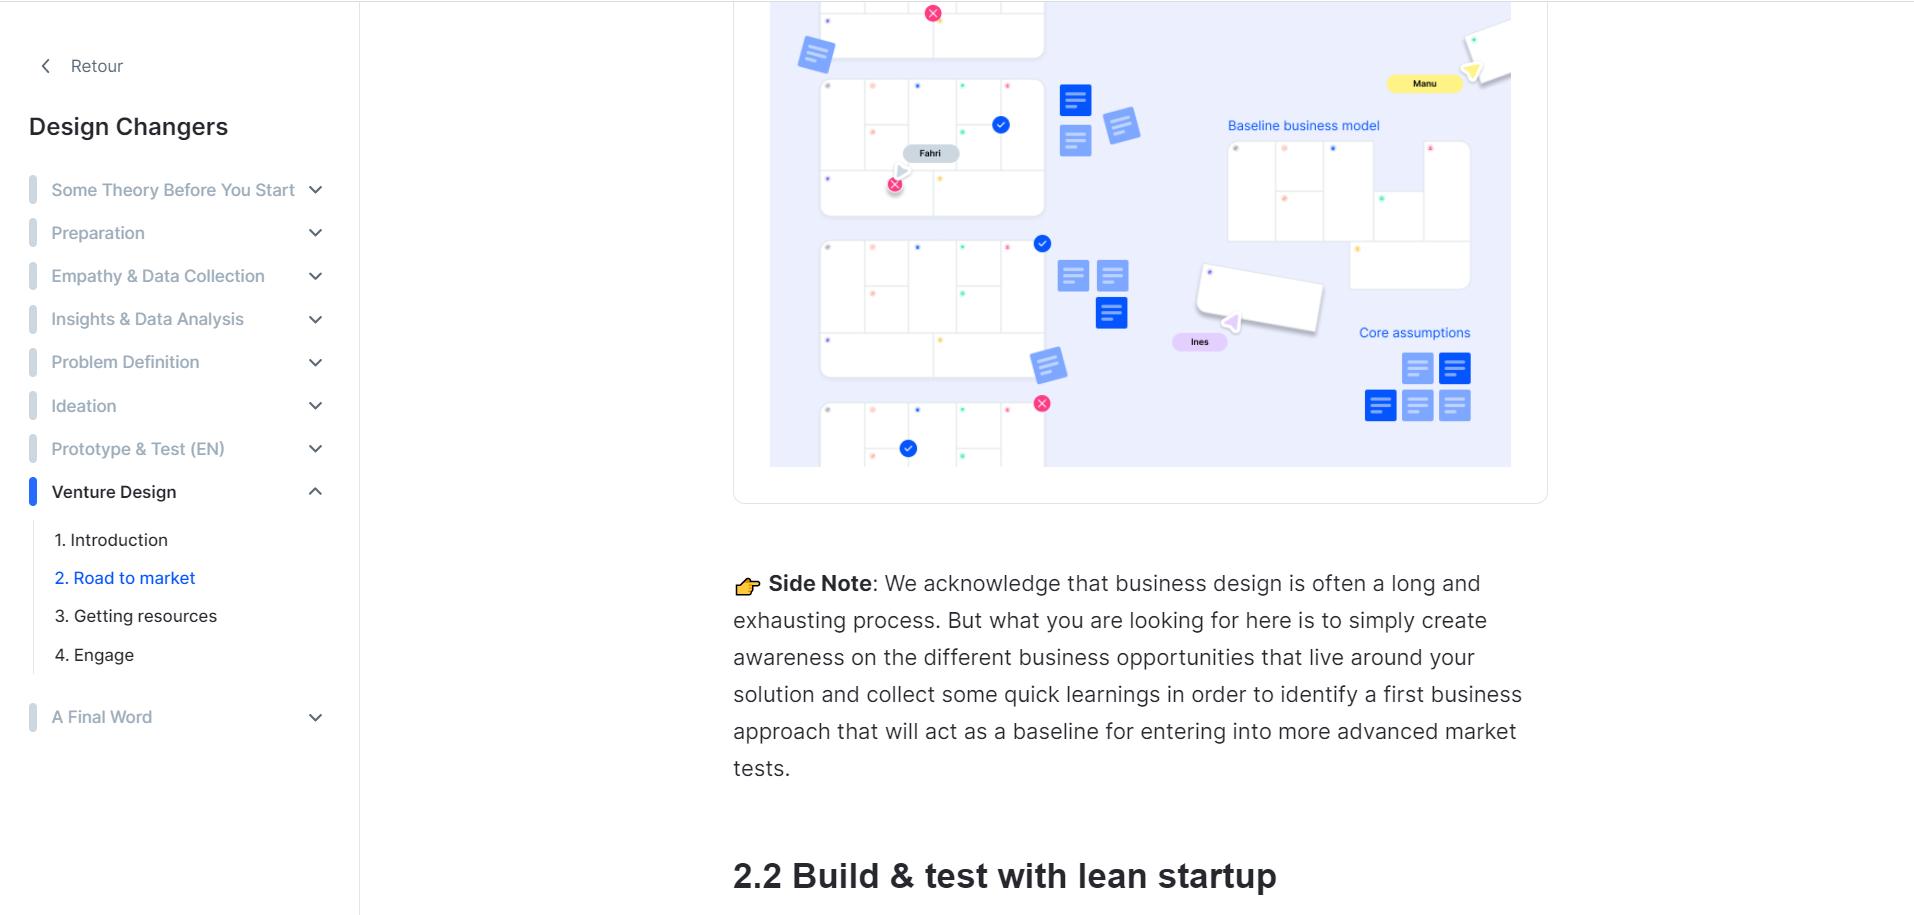 Built-in team methodology